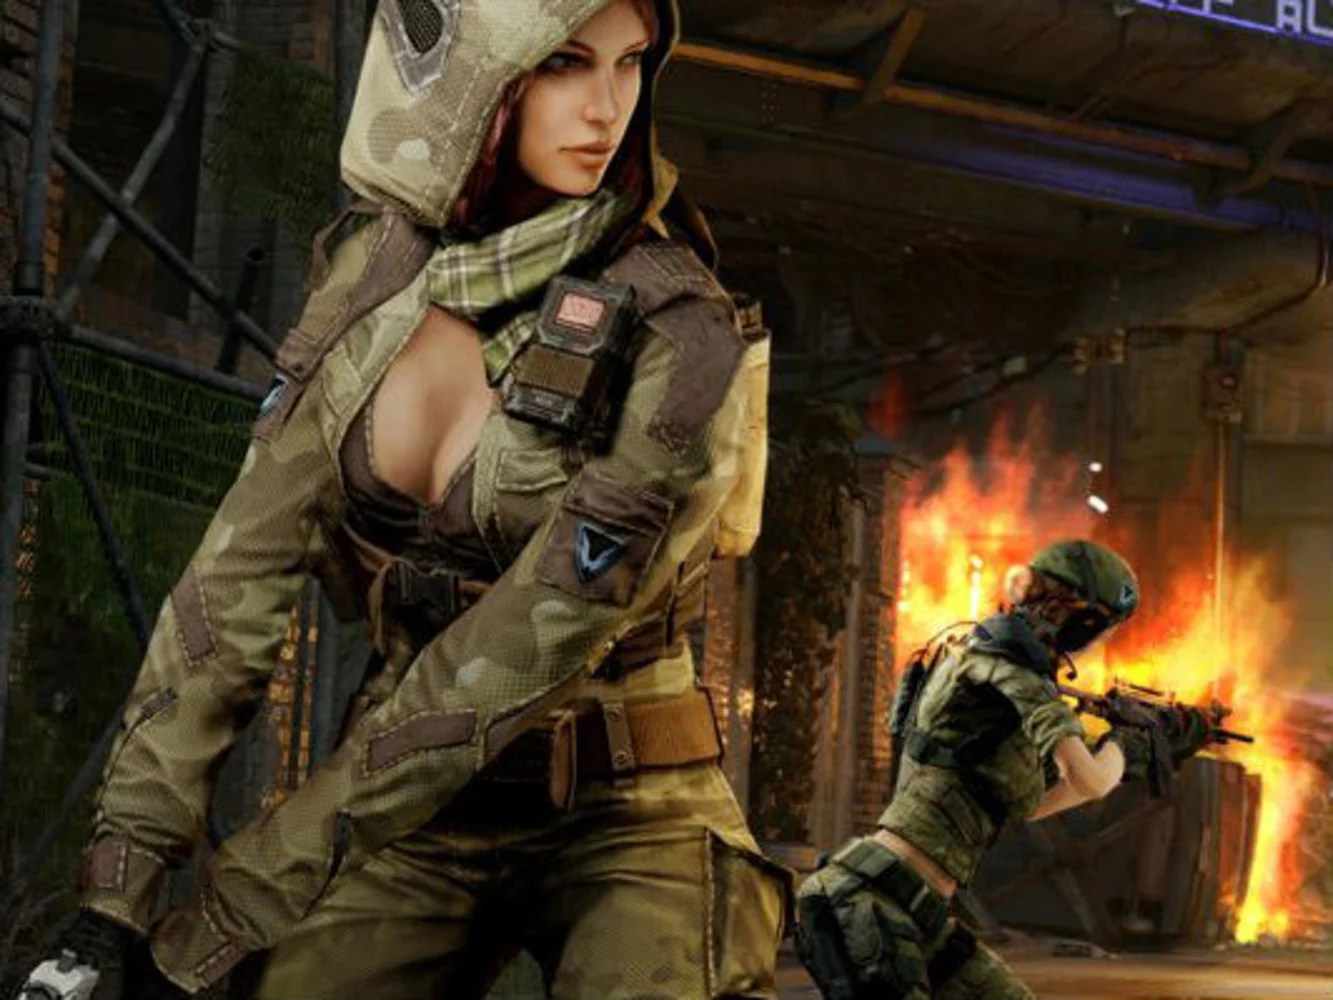 Gta Girl Gun Desktop Wallpaper Video Games Sexual Double Standard May Have Real World